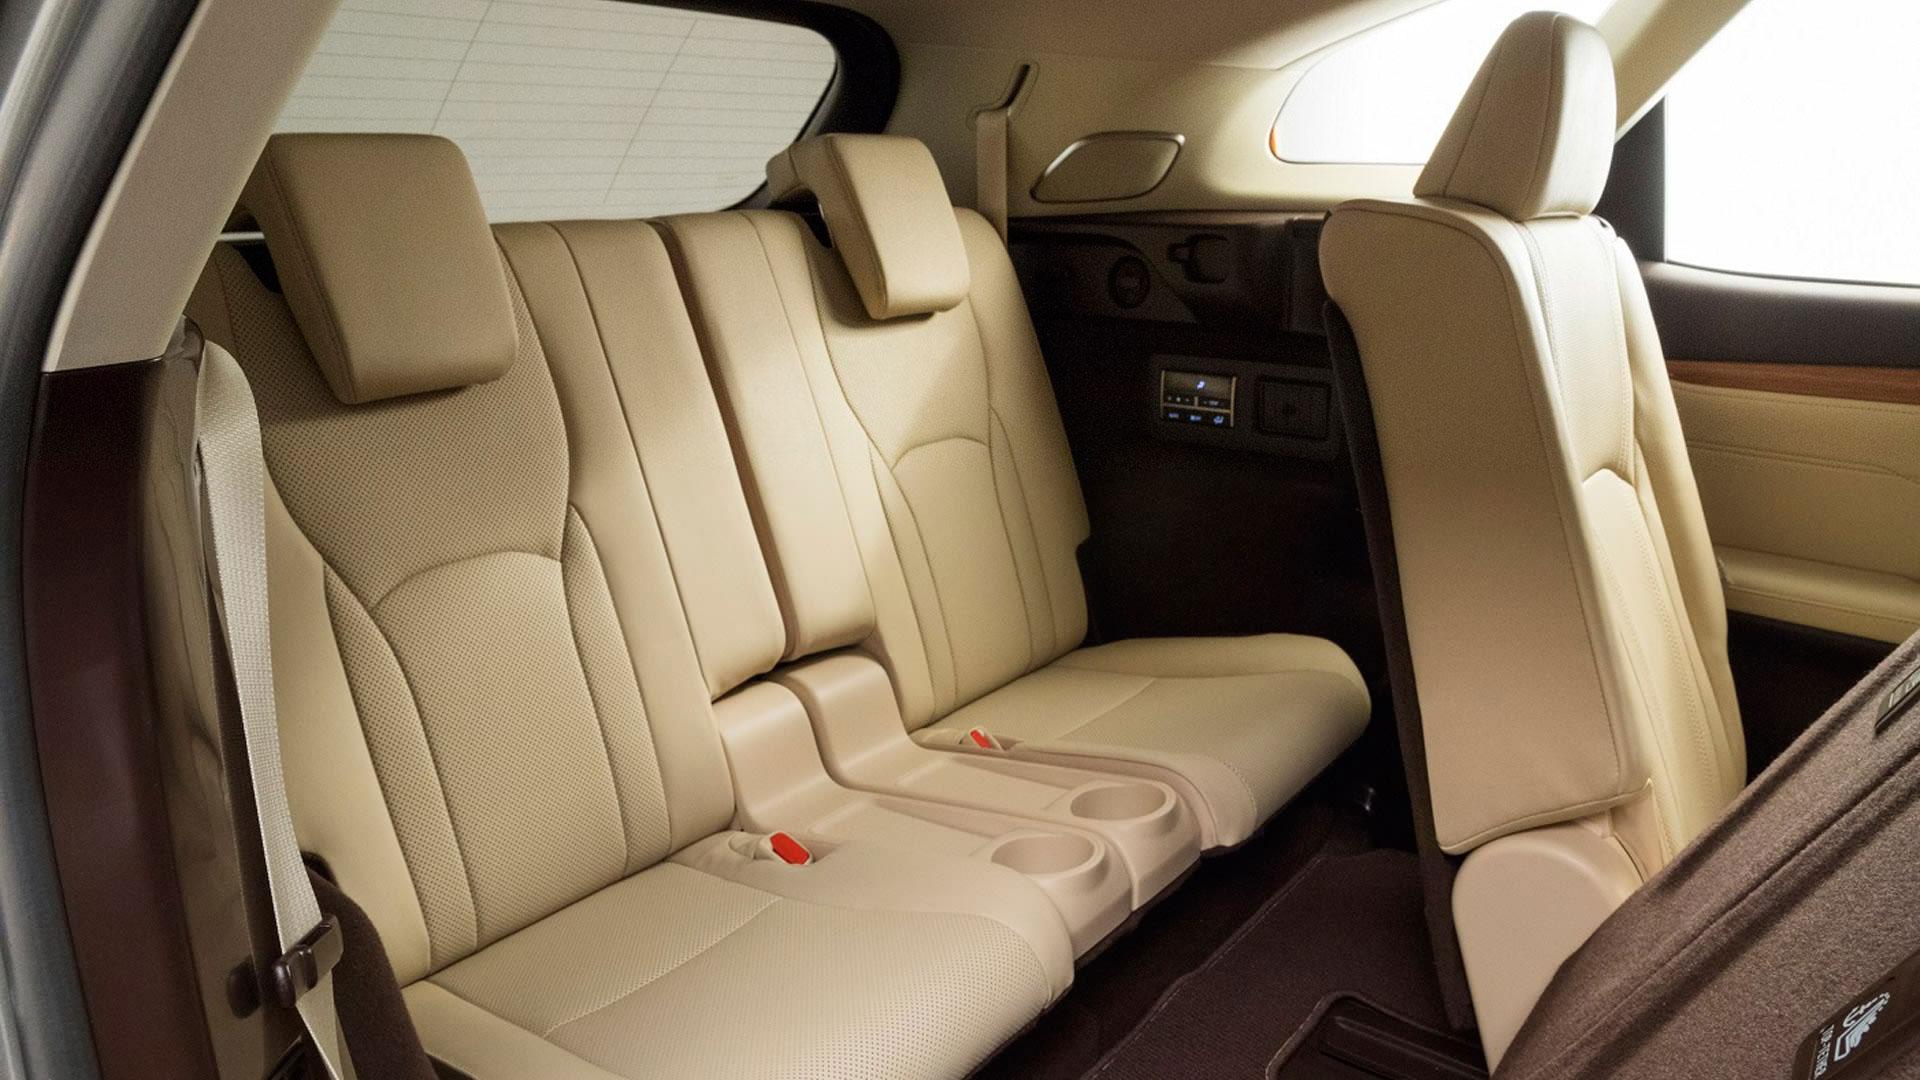 Lexus RX L gallery03 1920x1080 v2